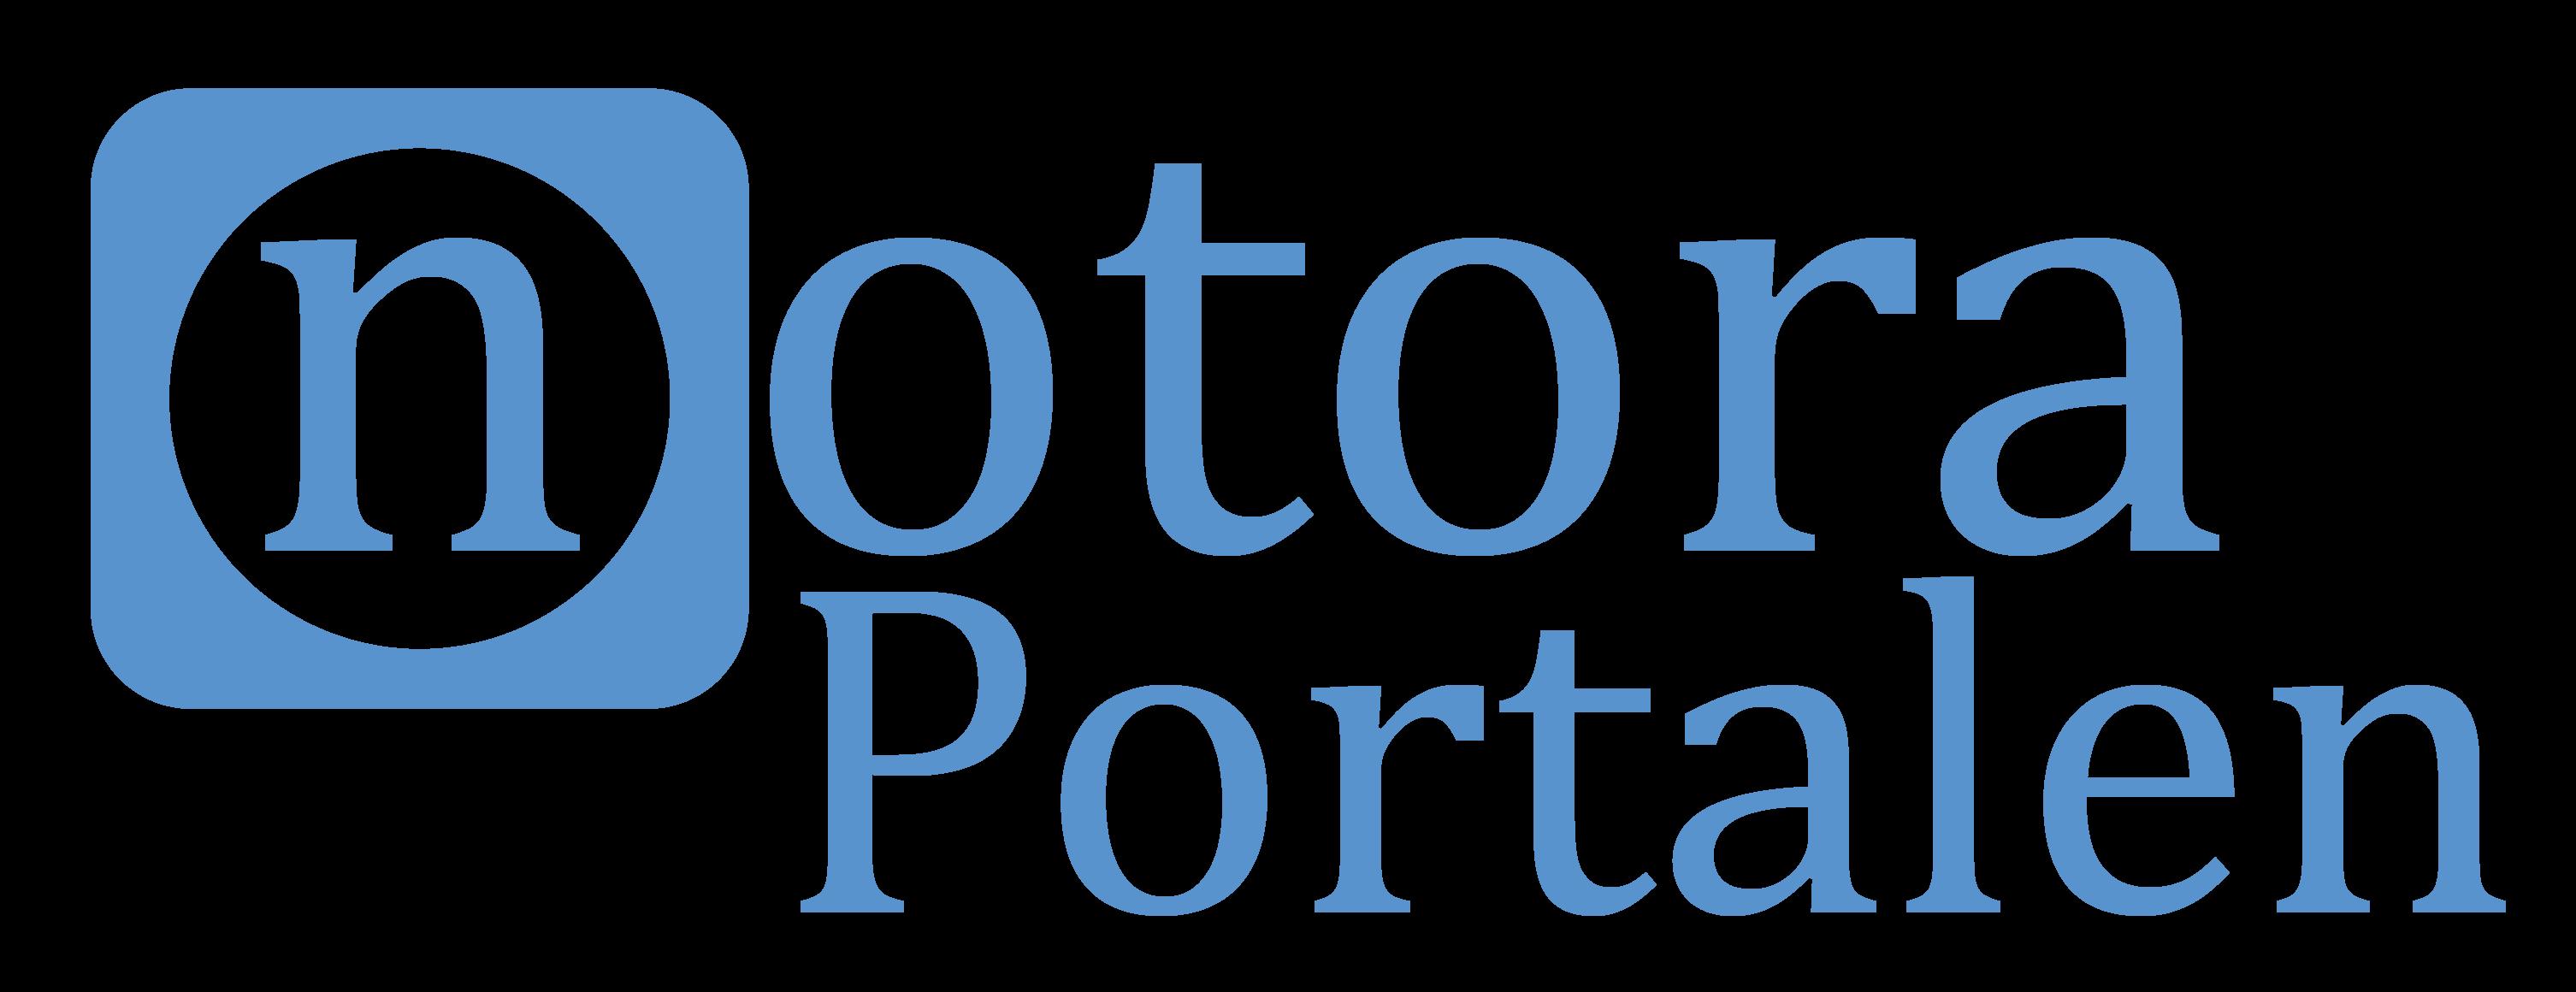 kontakt via notora portalen